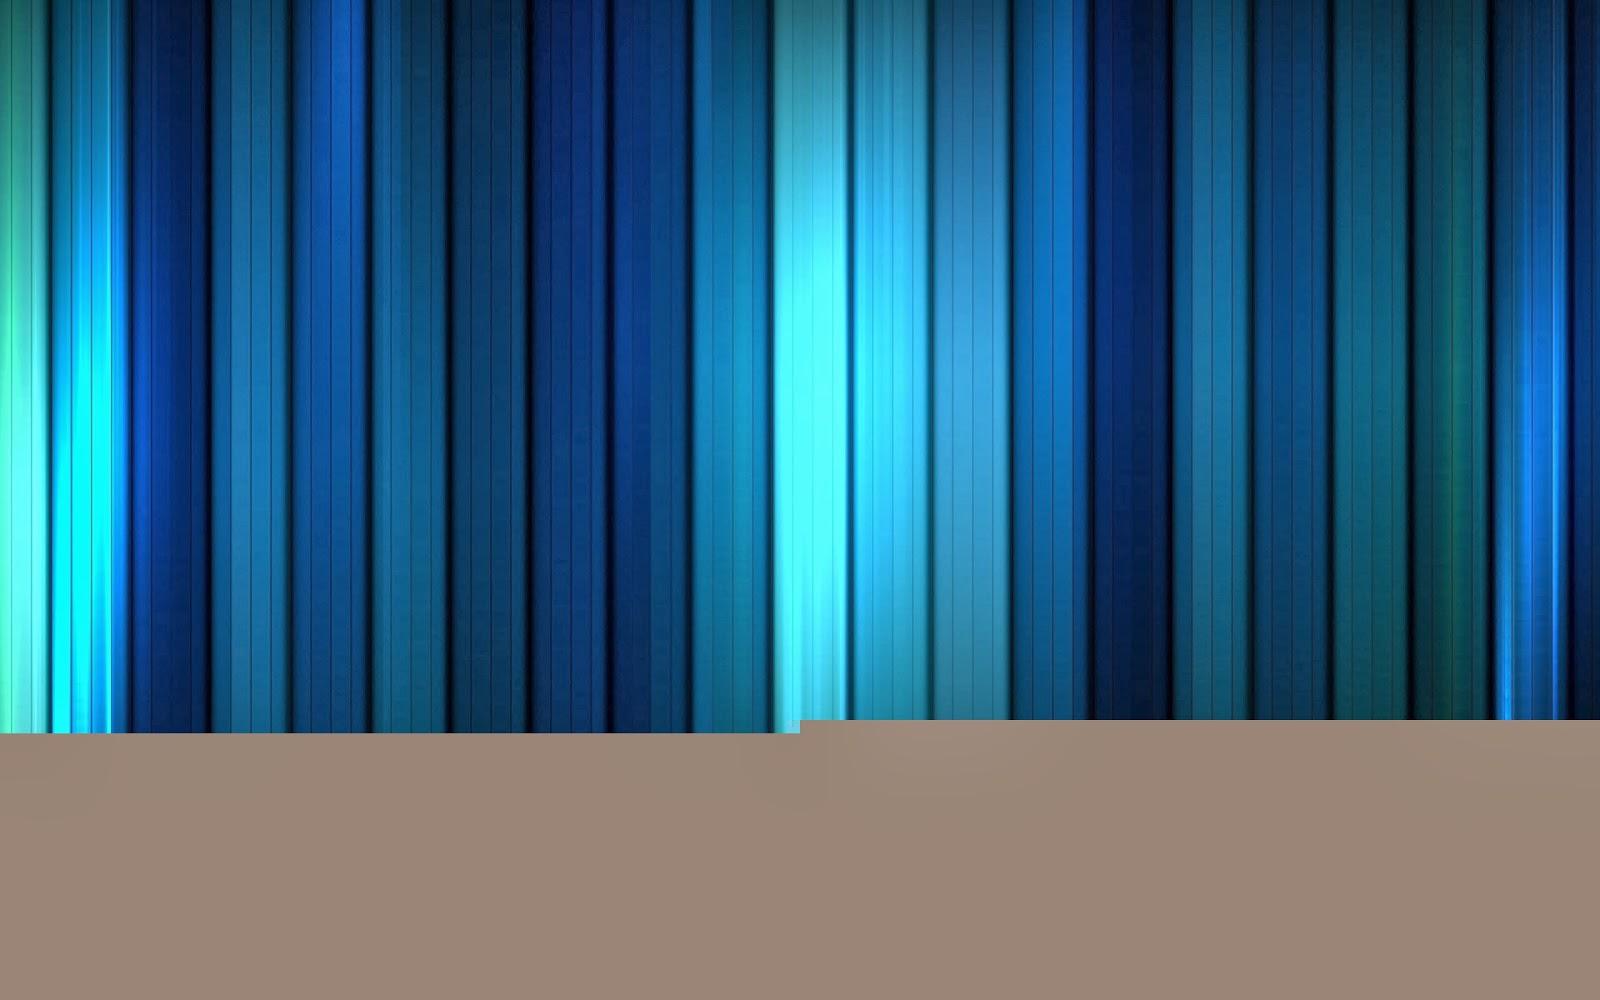 Website Backgrounds HD | HD Wallpapers in|Desktop ...